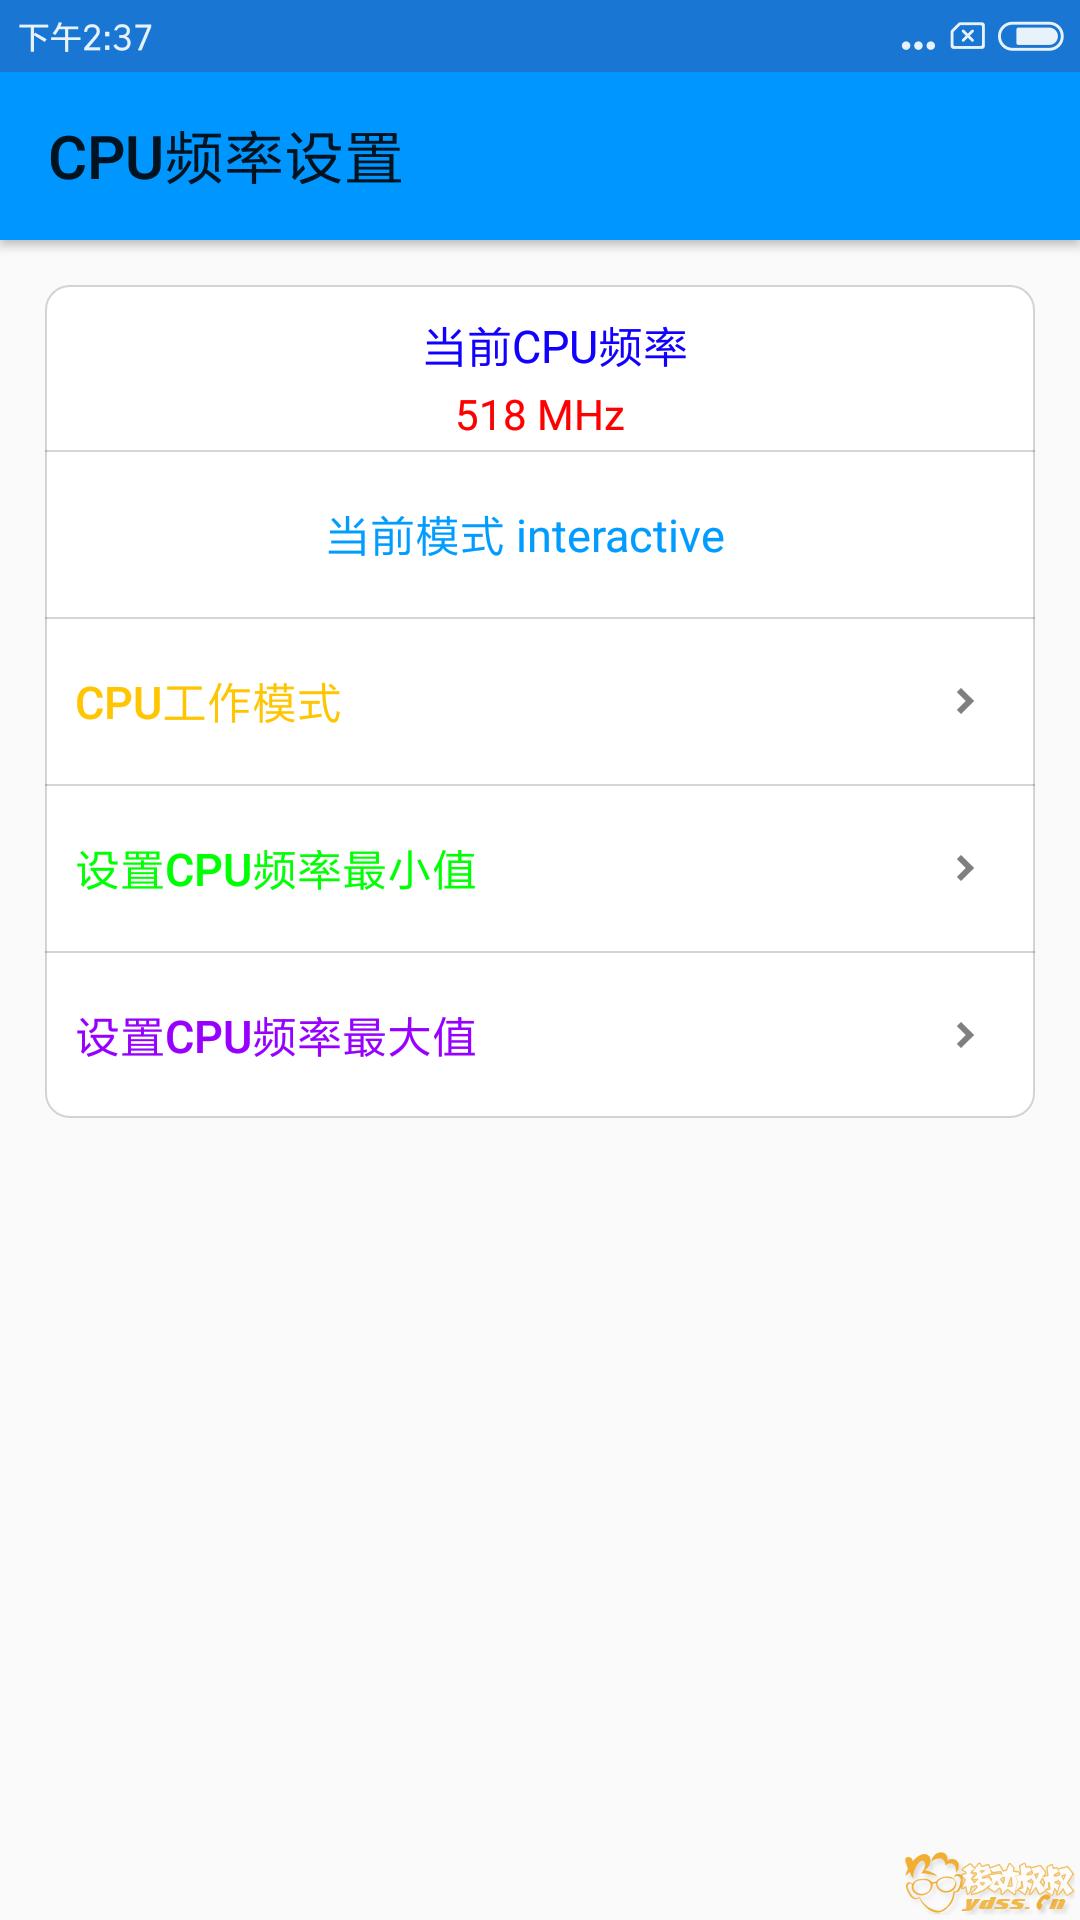 Screenshot_2018-11-08-14-37-45-601_com.zhanhong.tools.png